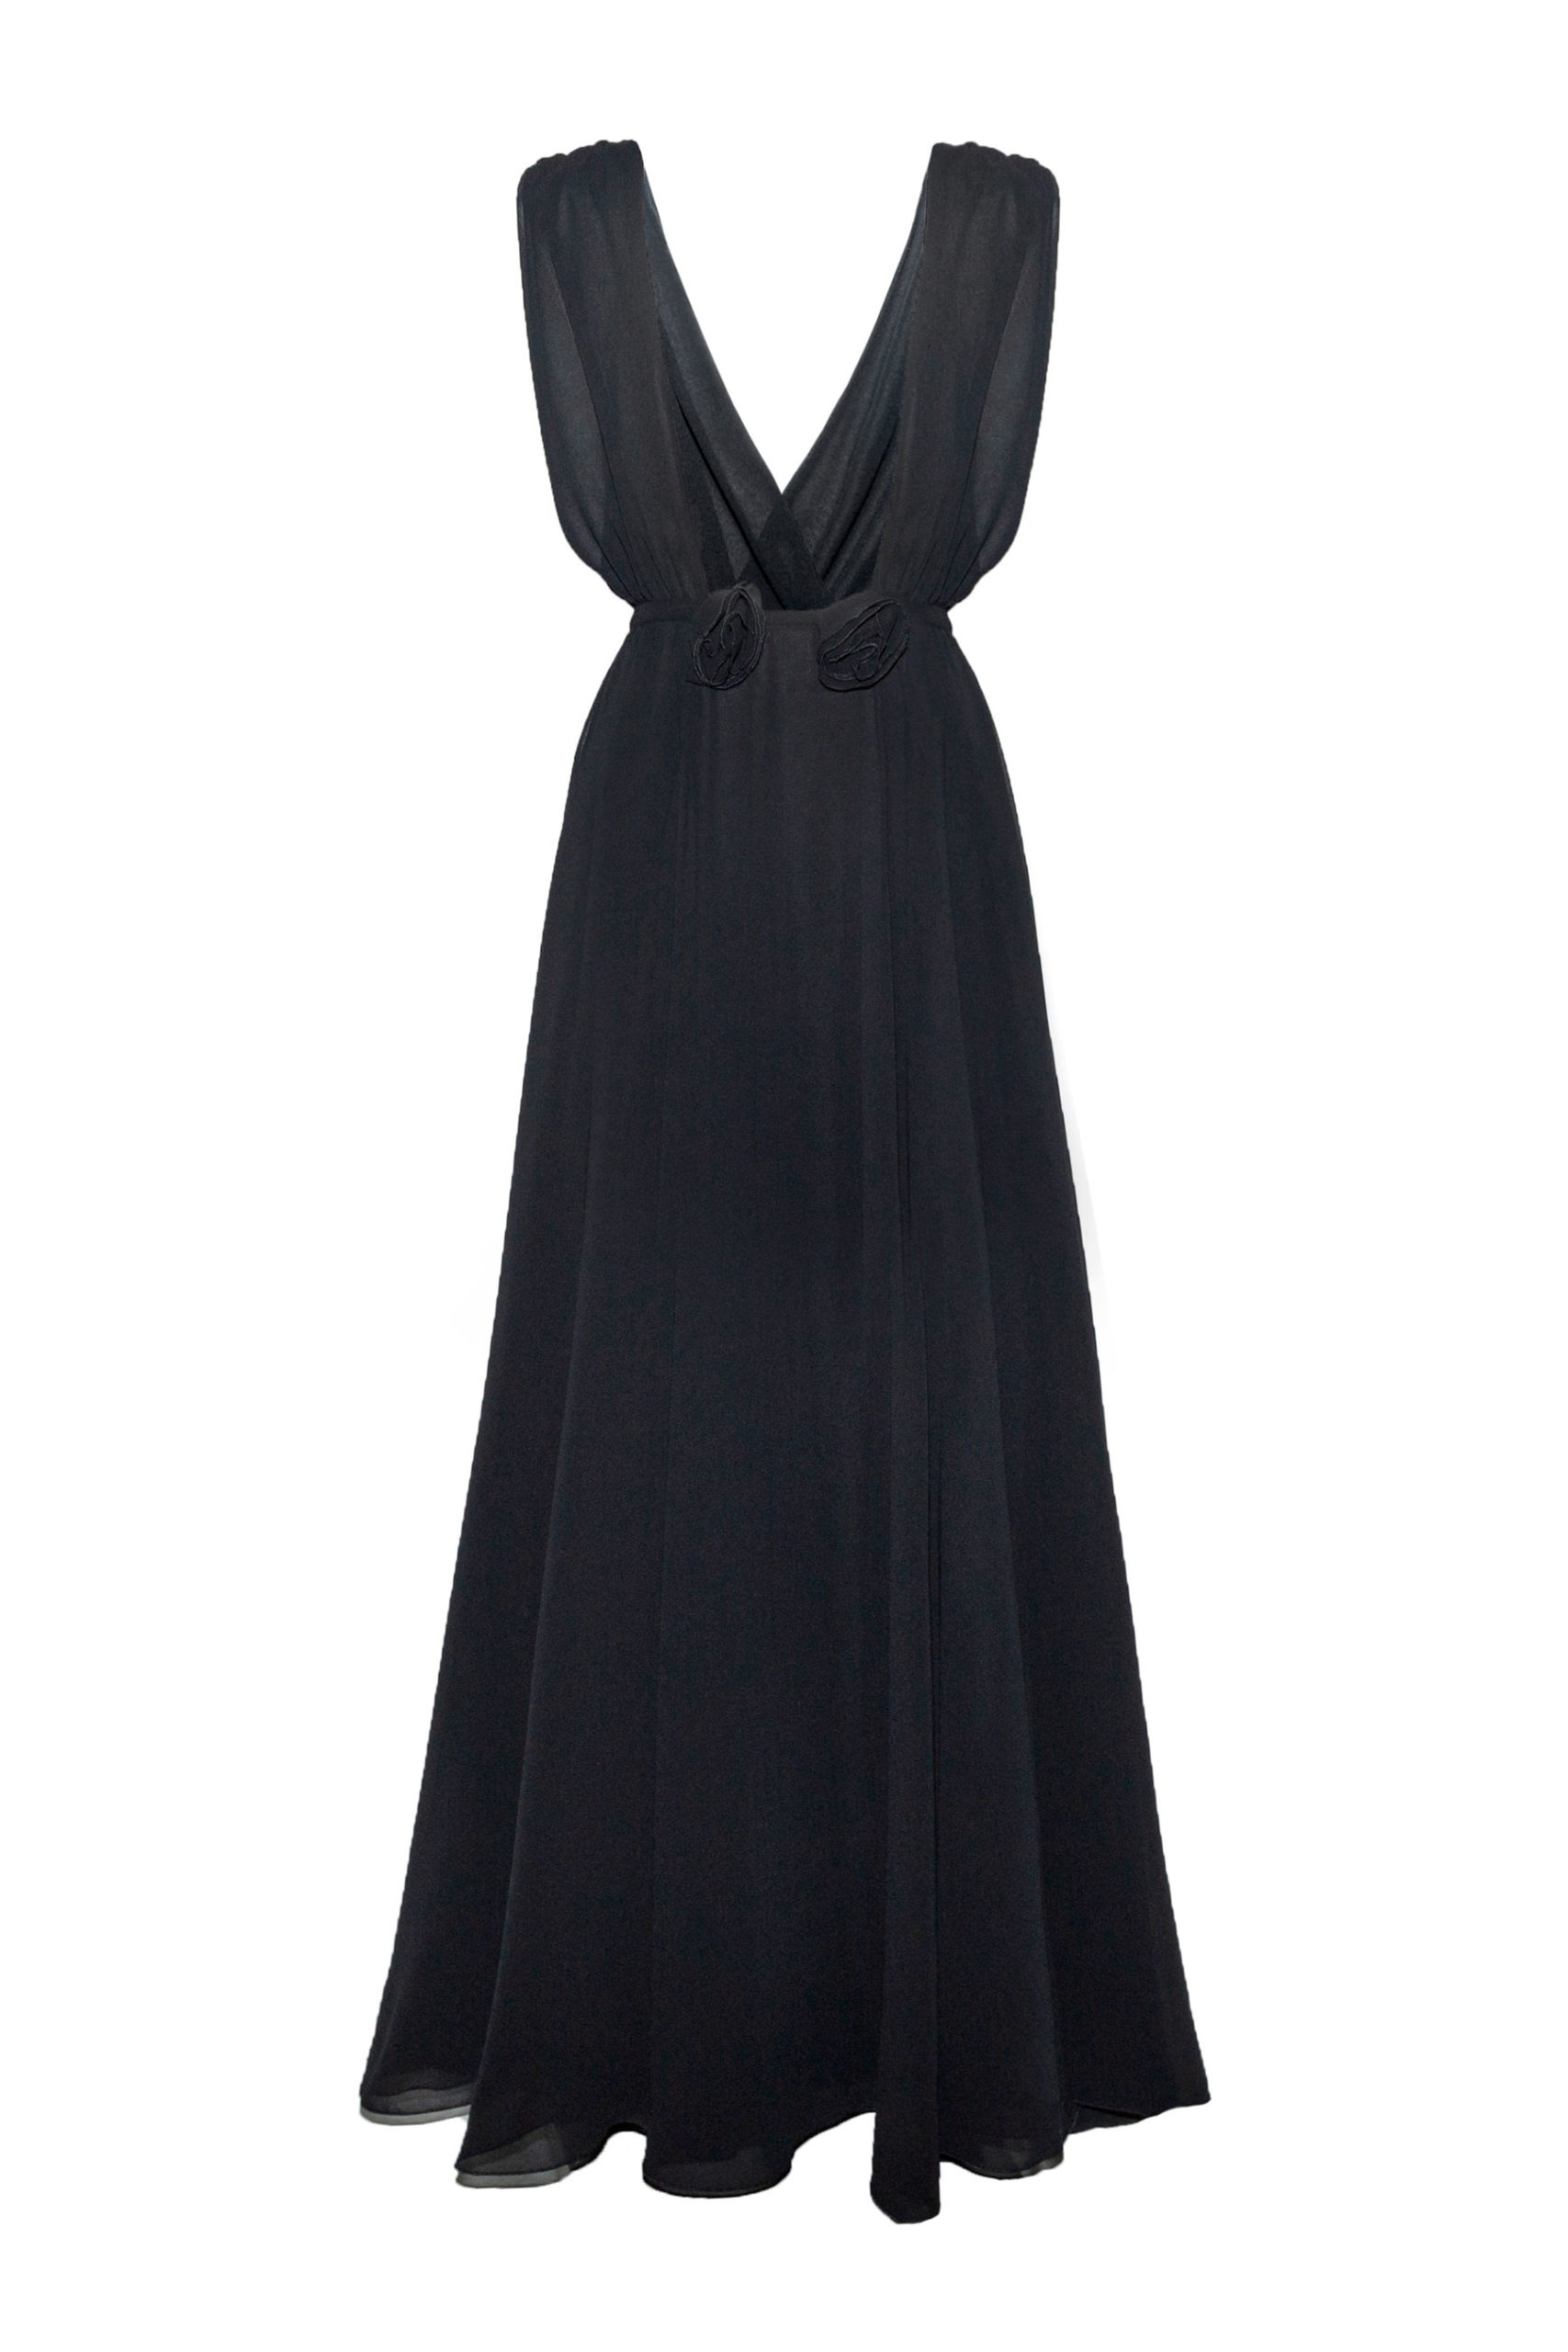 Paula black dress